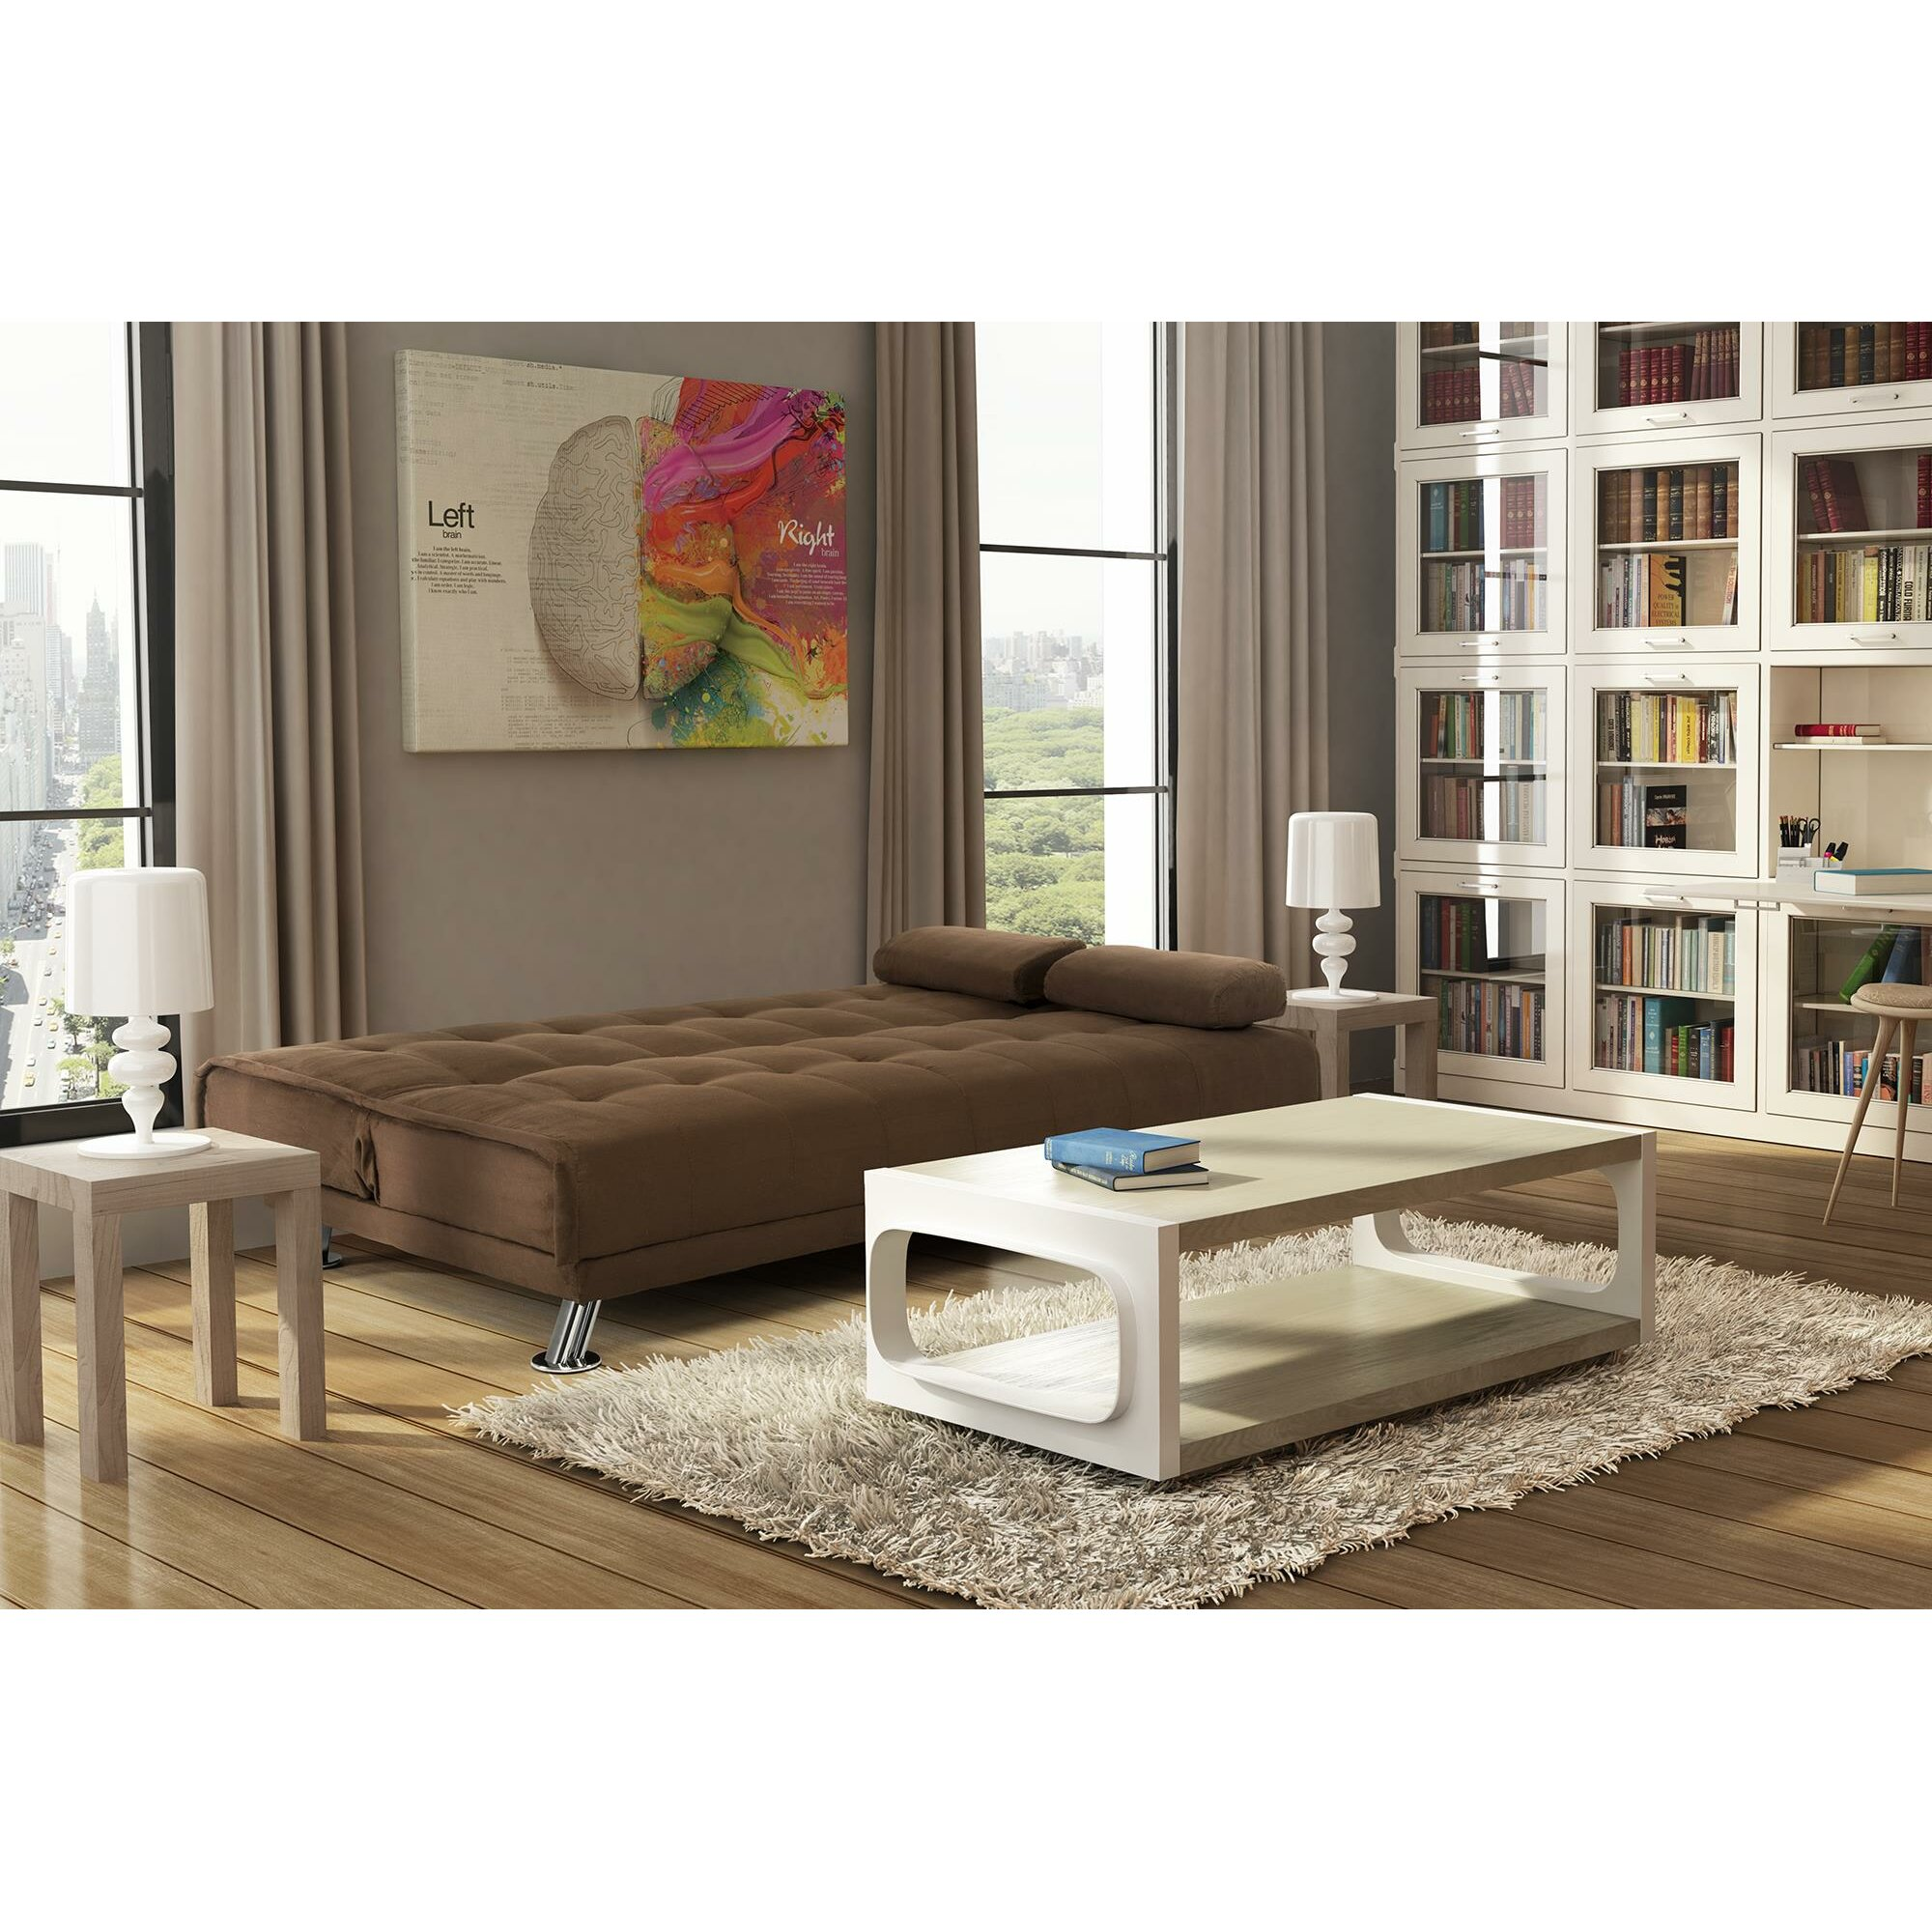 Living Room Decorating Ideas Fresh Dillards Bedroom Furniture